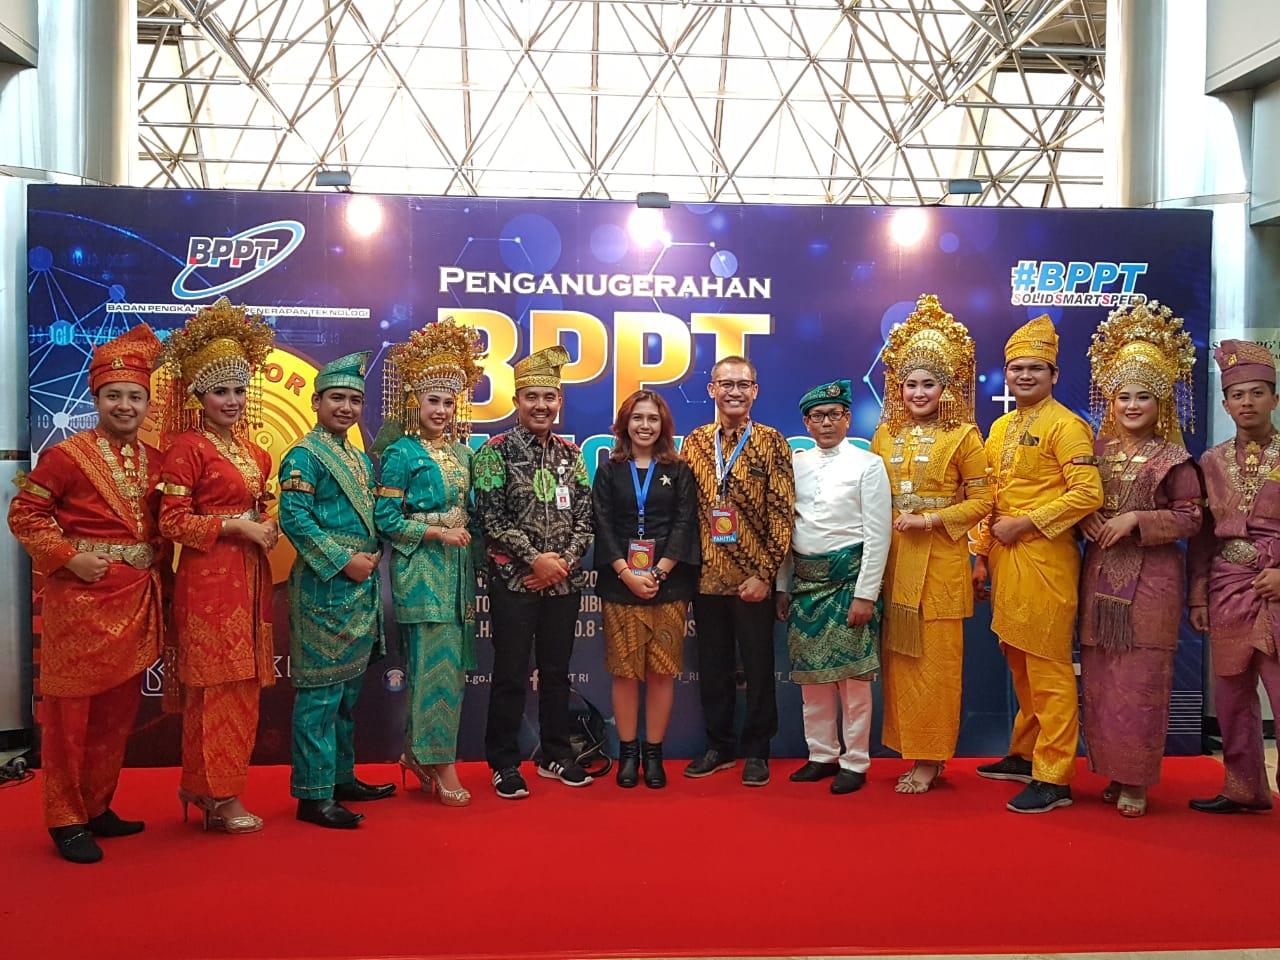 Kepala Dinas Parbudpora Anharizal bersama Tim Kesenian Kabupaten Bengkalis pada ajang Penganugerahan BPPT Awards 2019